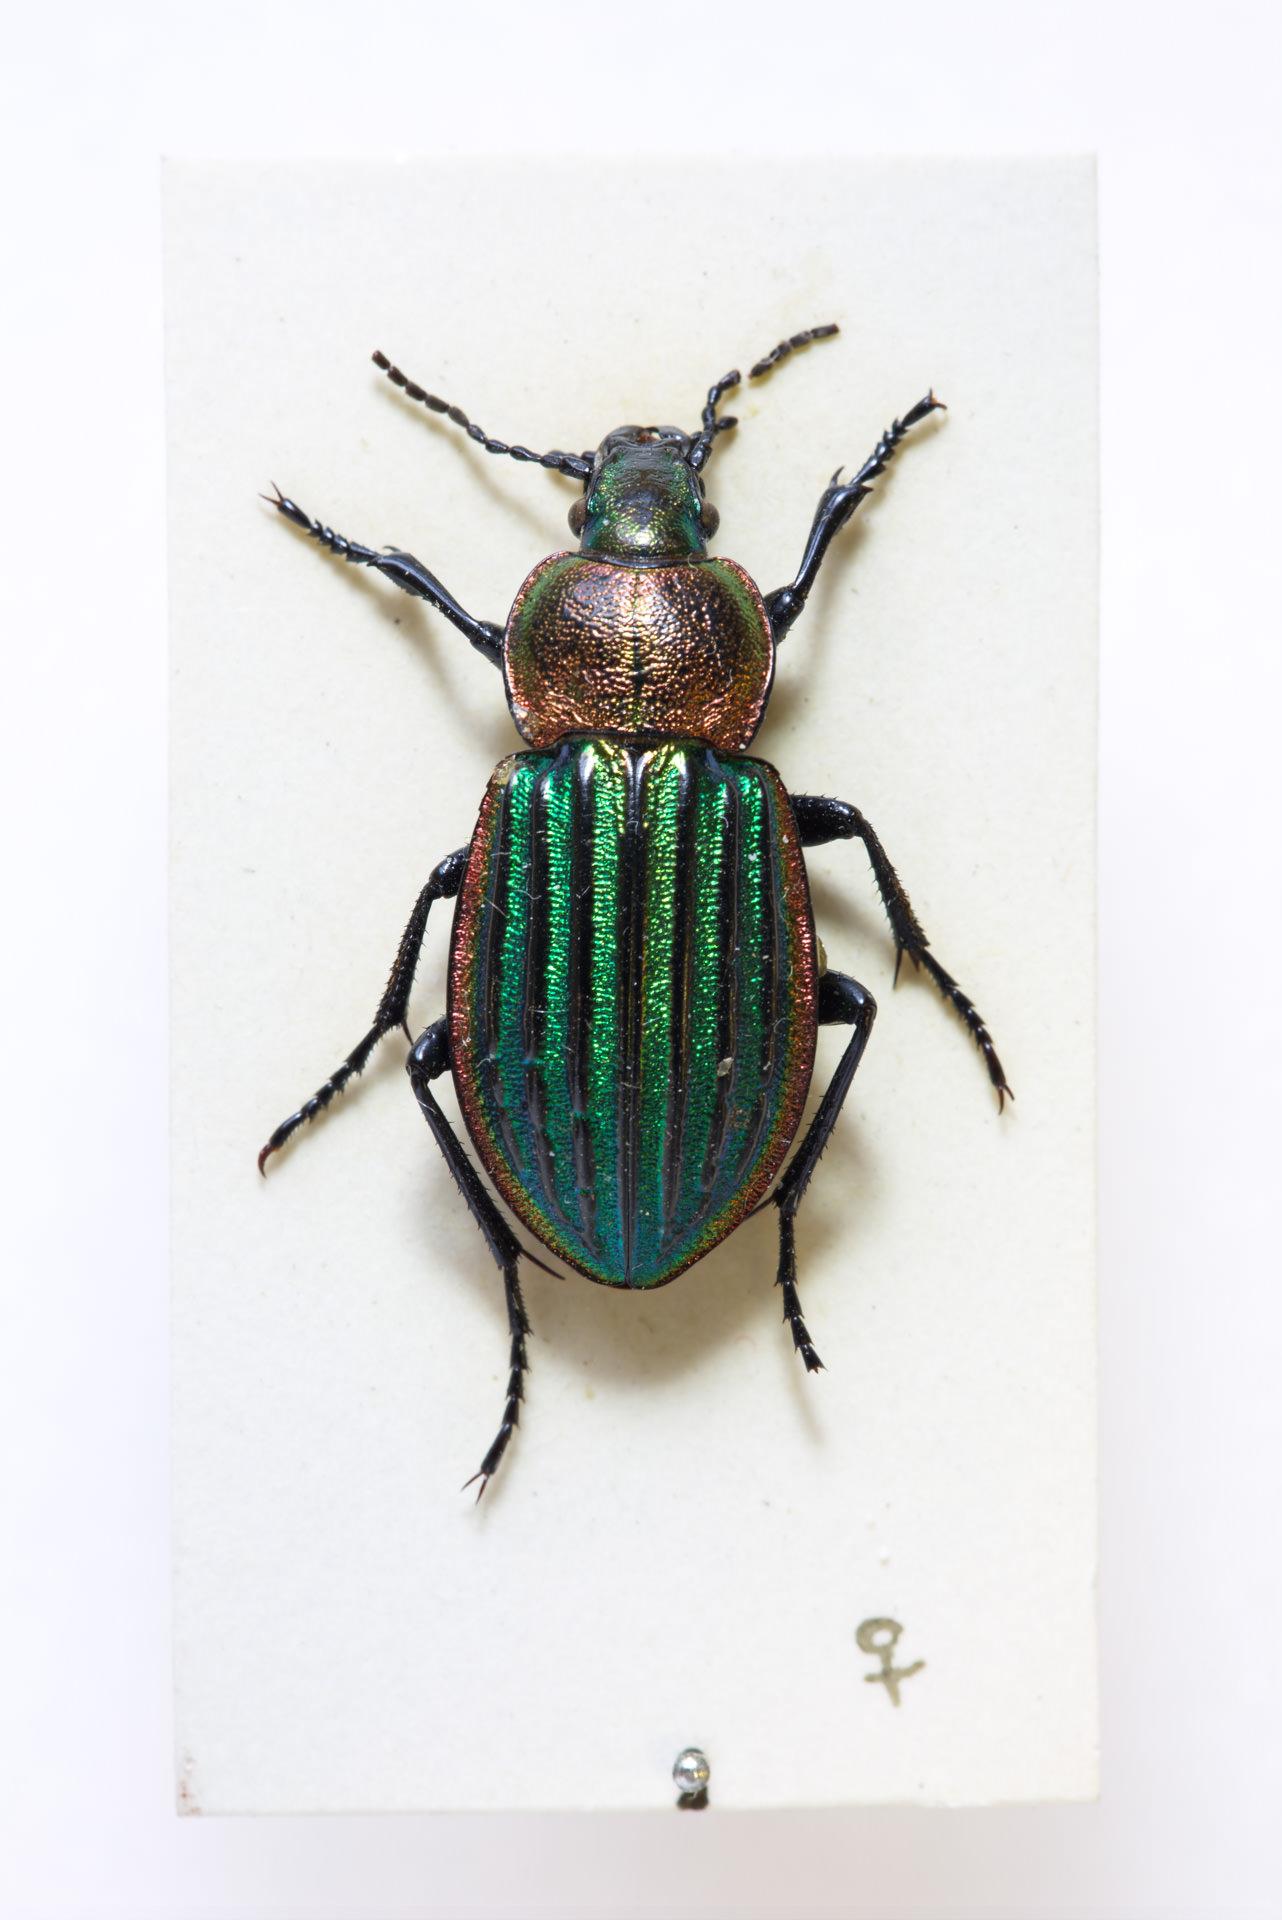 Carabus Nitens beetle.